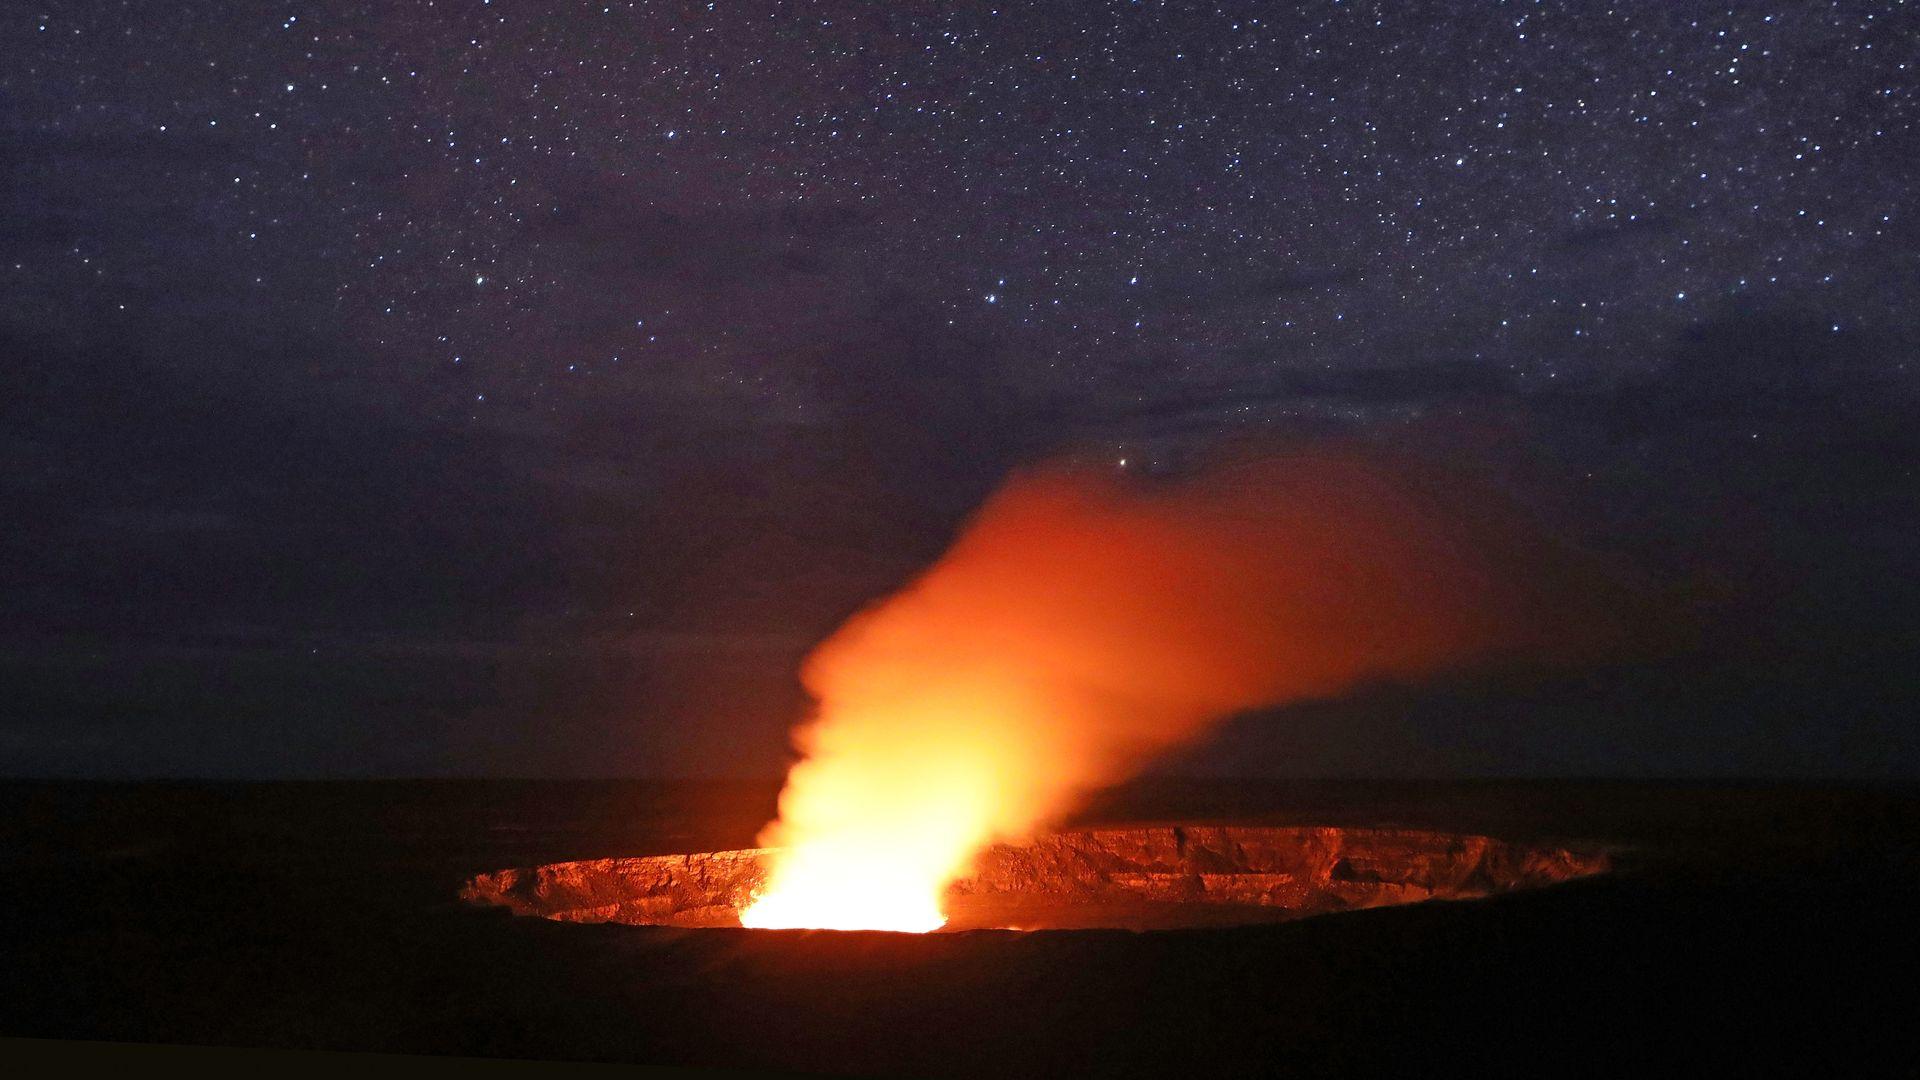 Kilauea causing a plume to rise